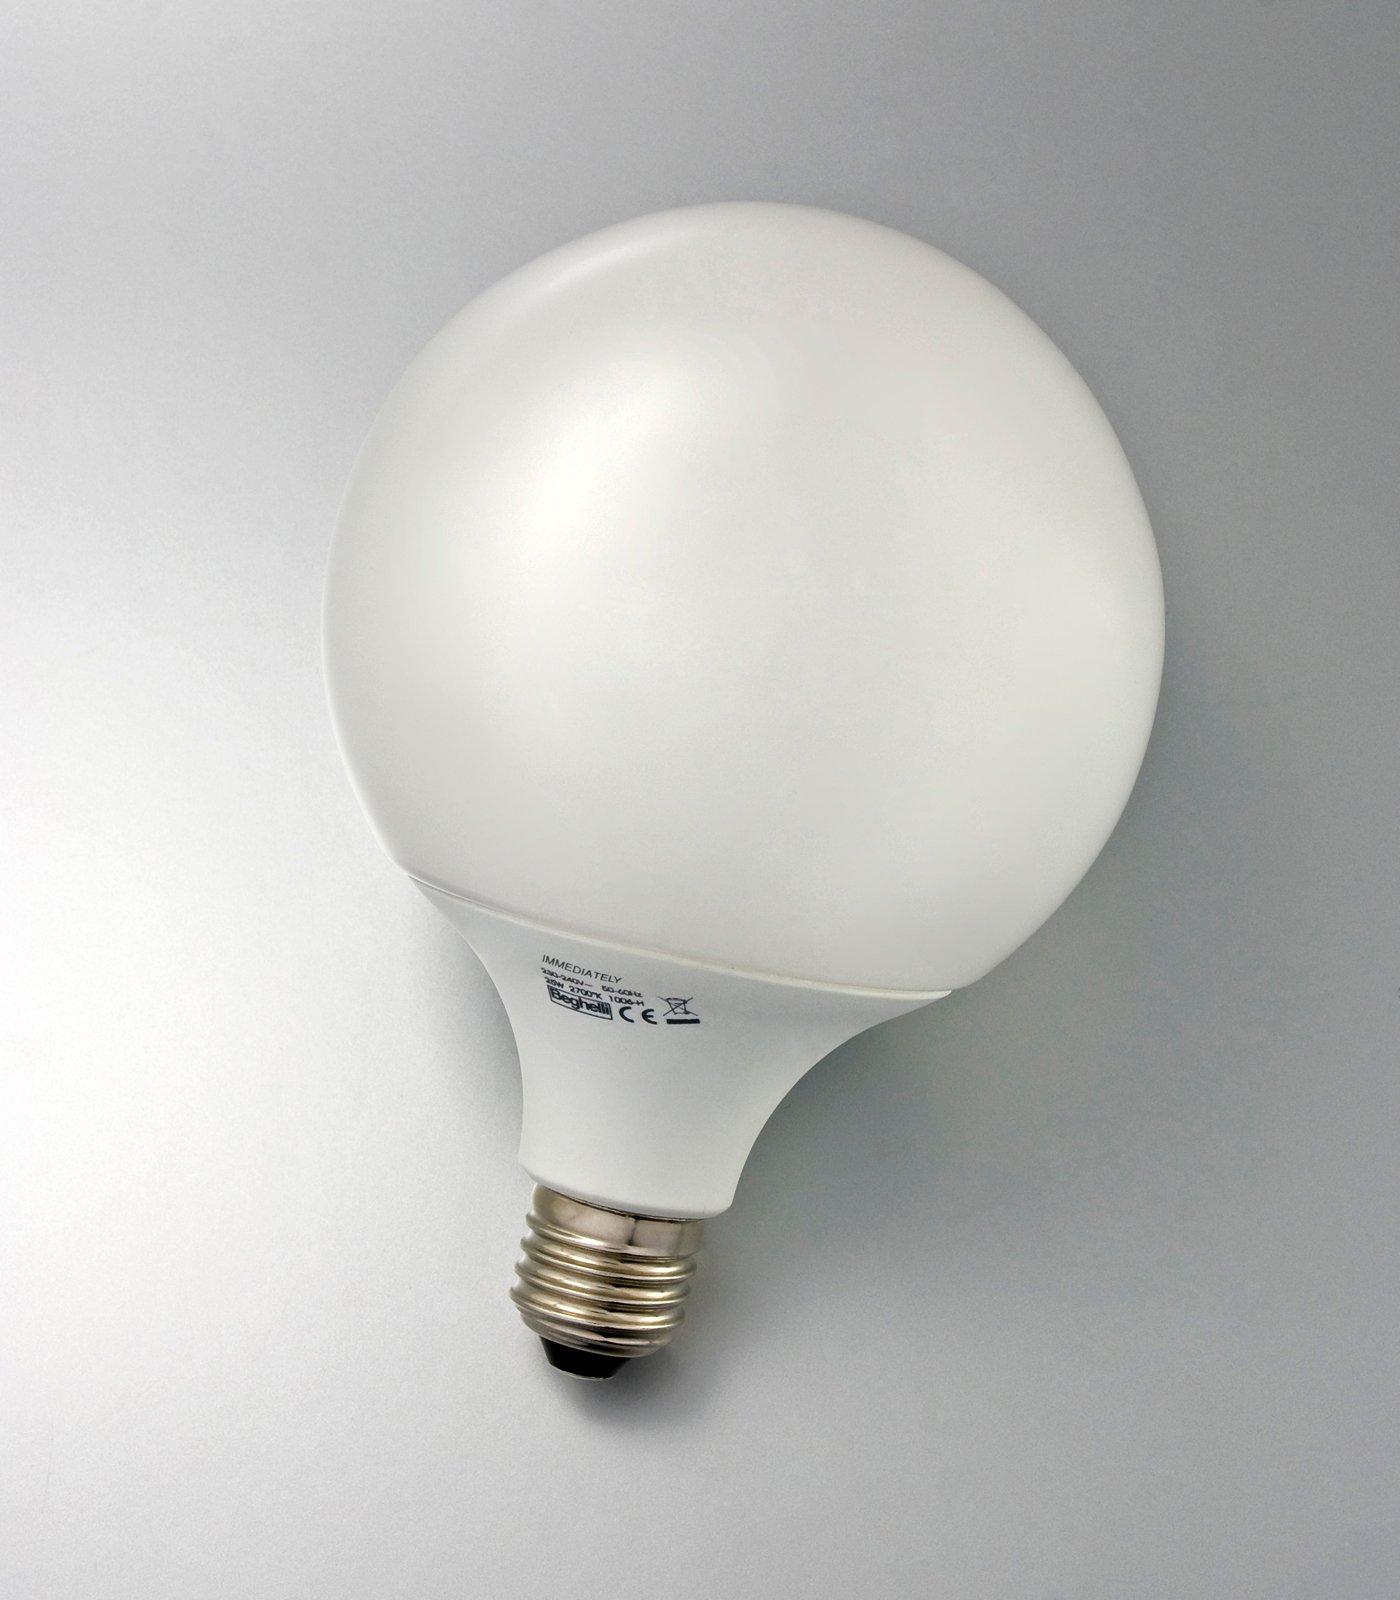 g lampadina : Ricerche correlate a Lampade led beghelli dimmerabili